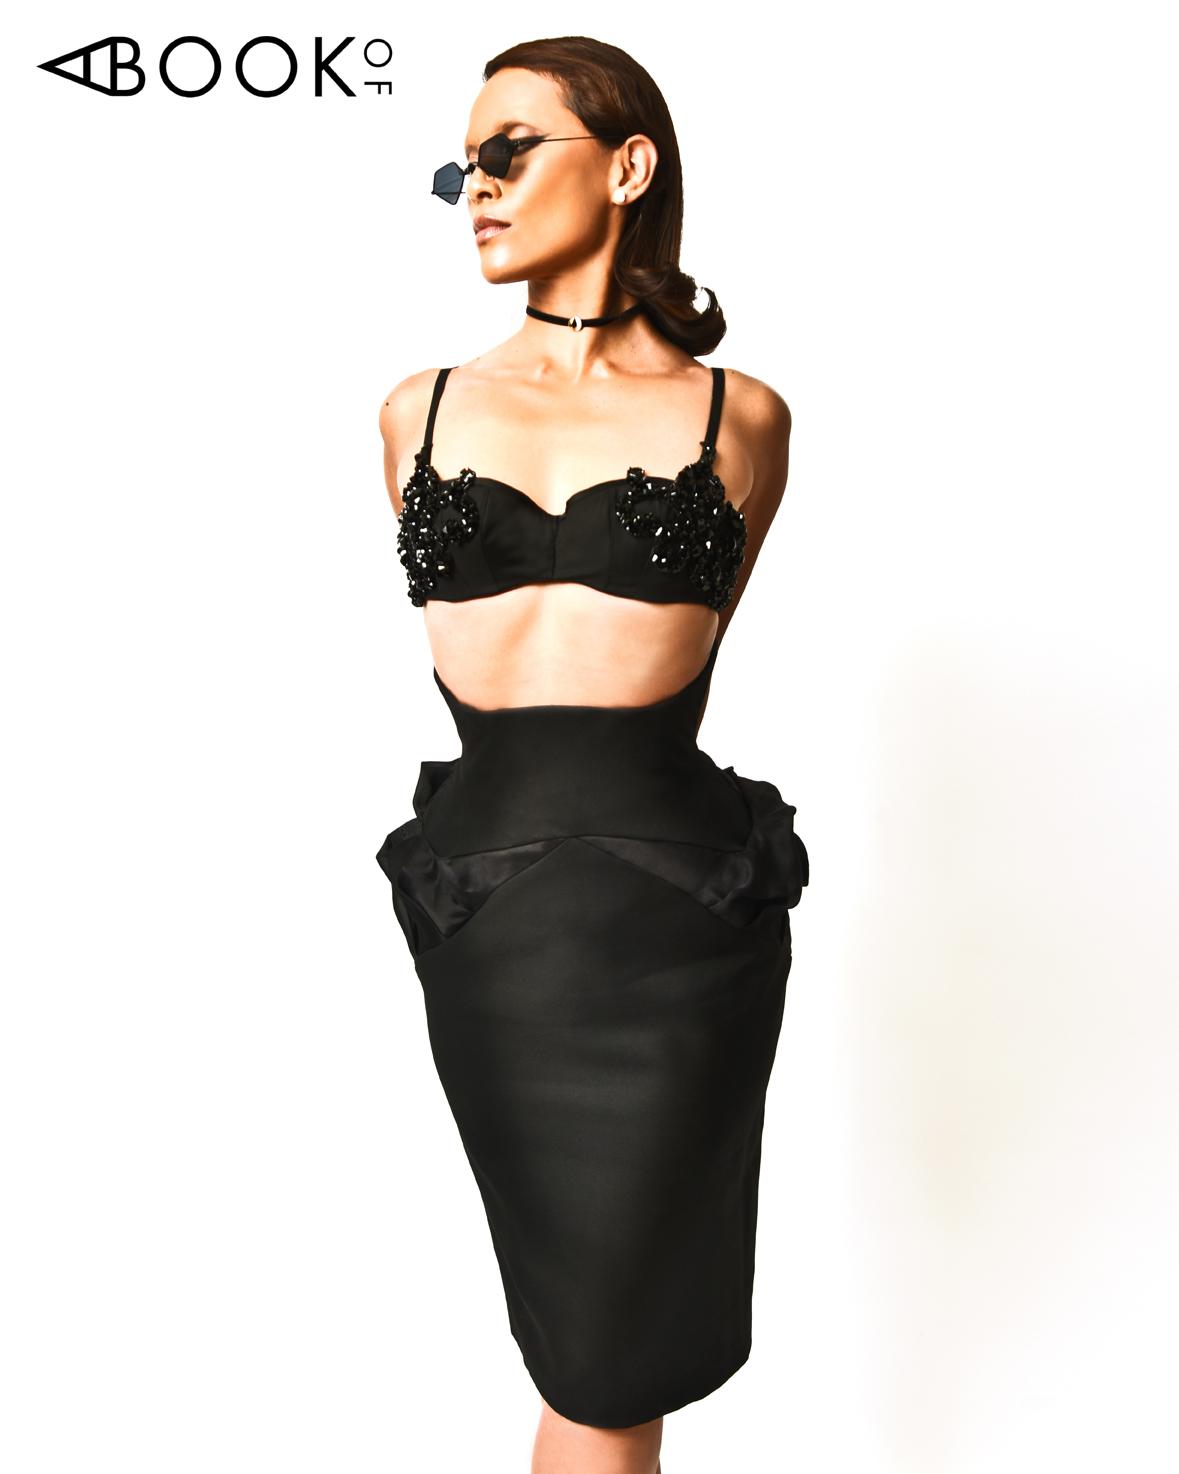 ABO LESLEY-ANN BRANDT_Claudia Savage_corset.jpg